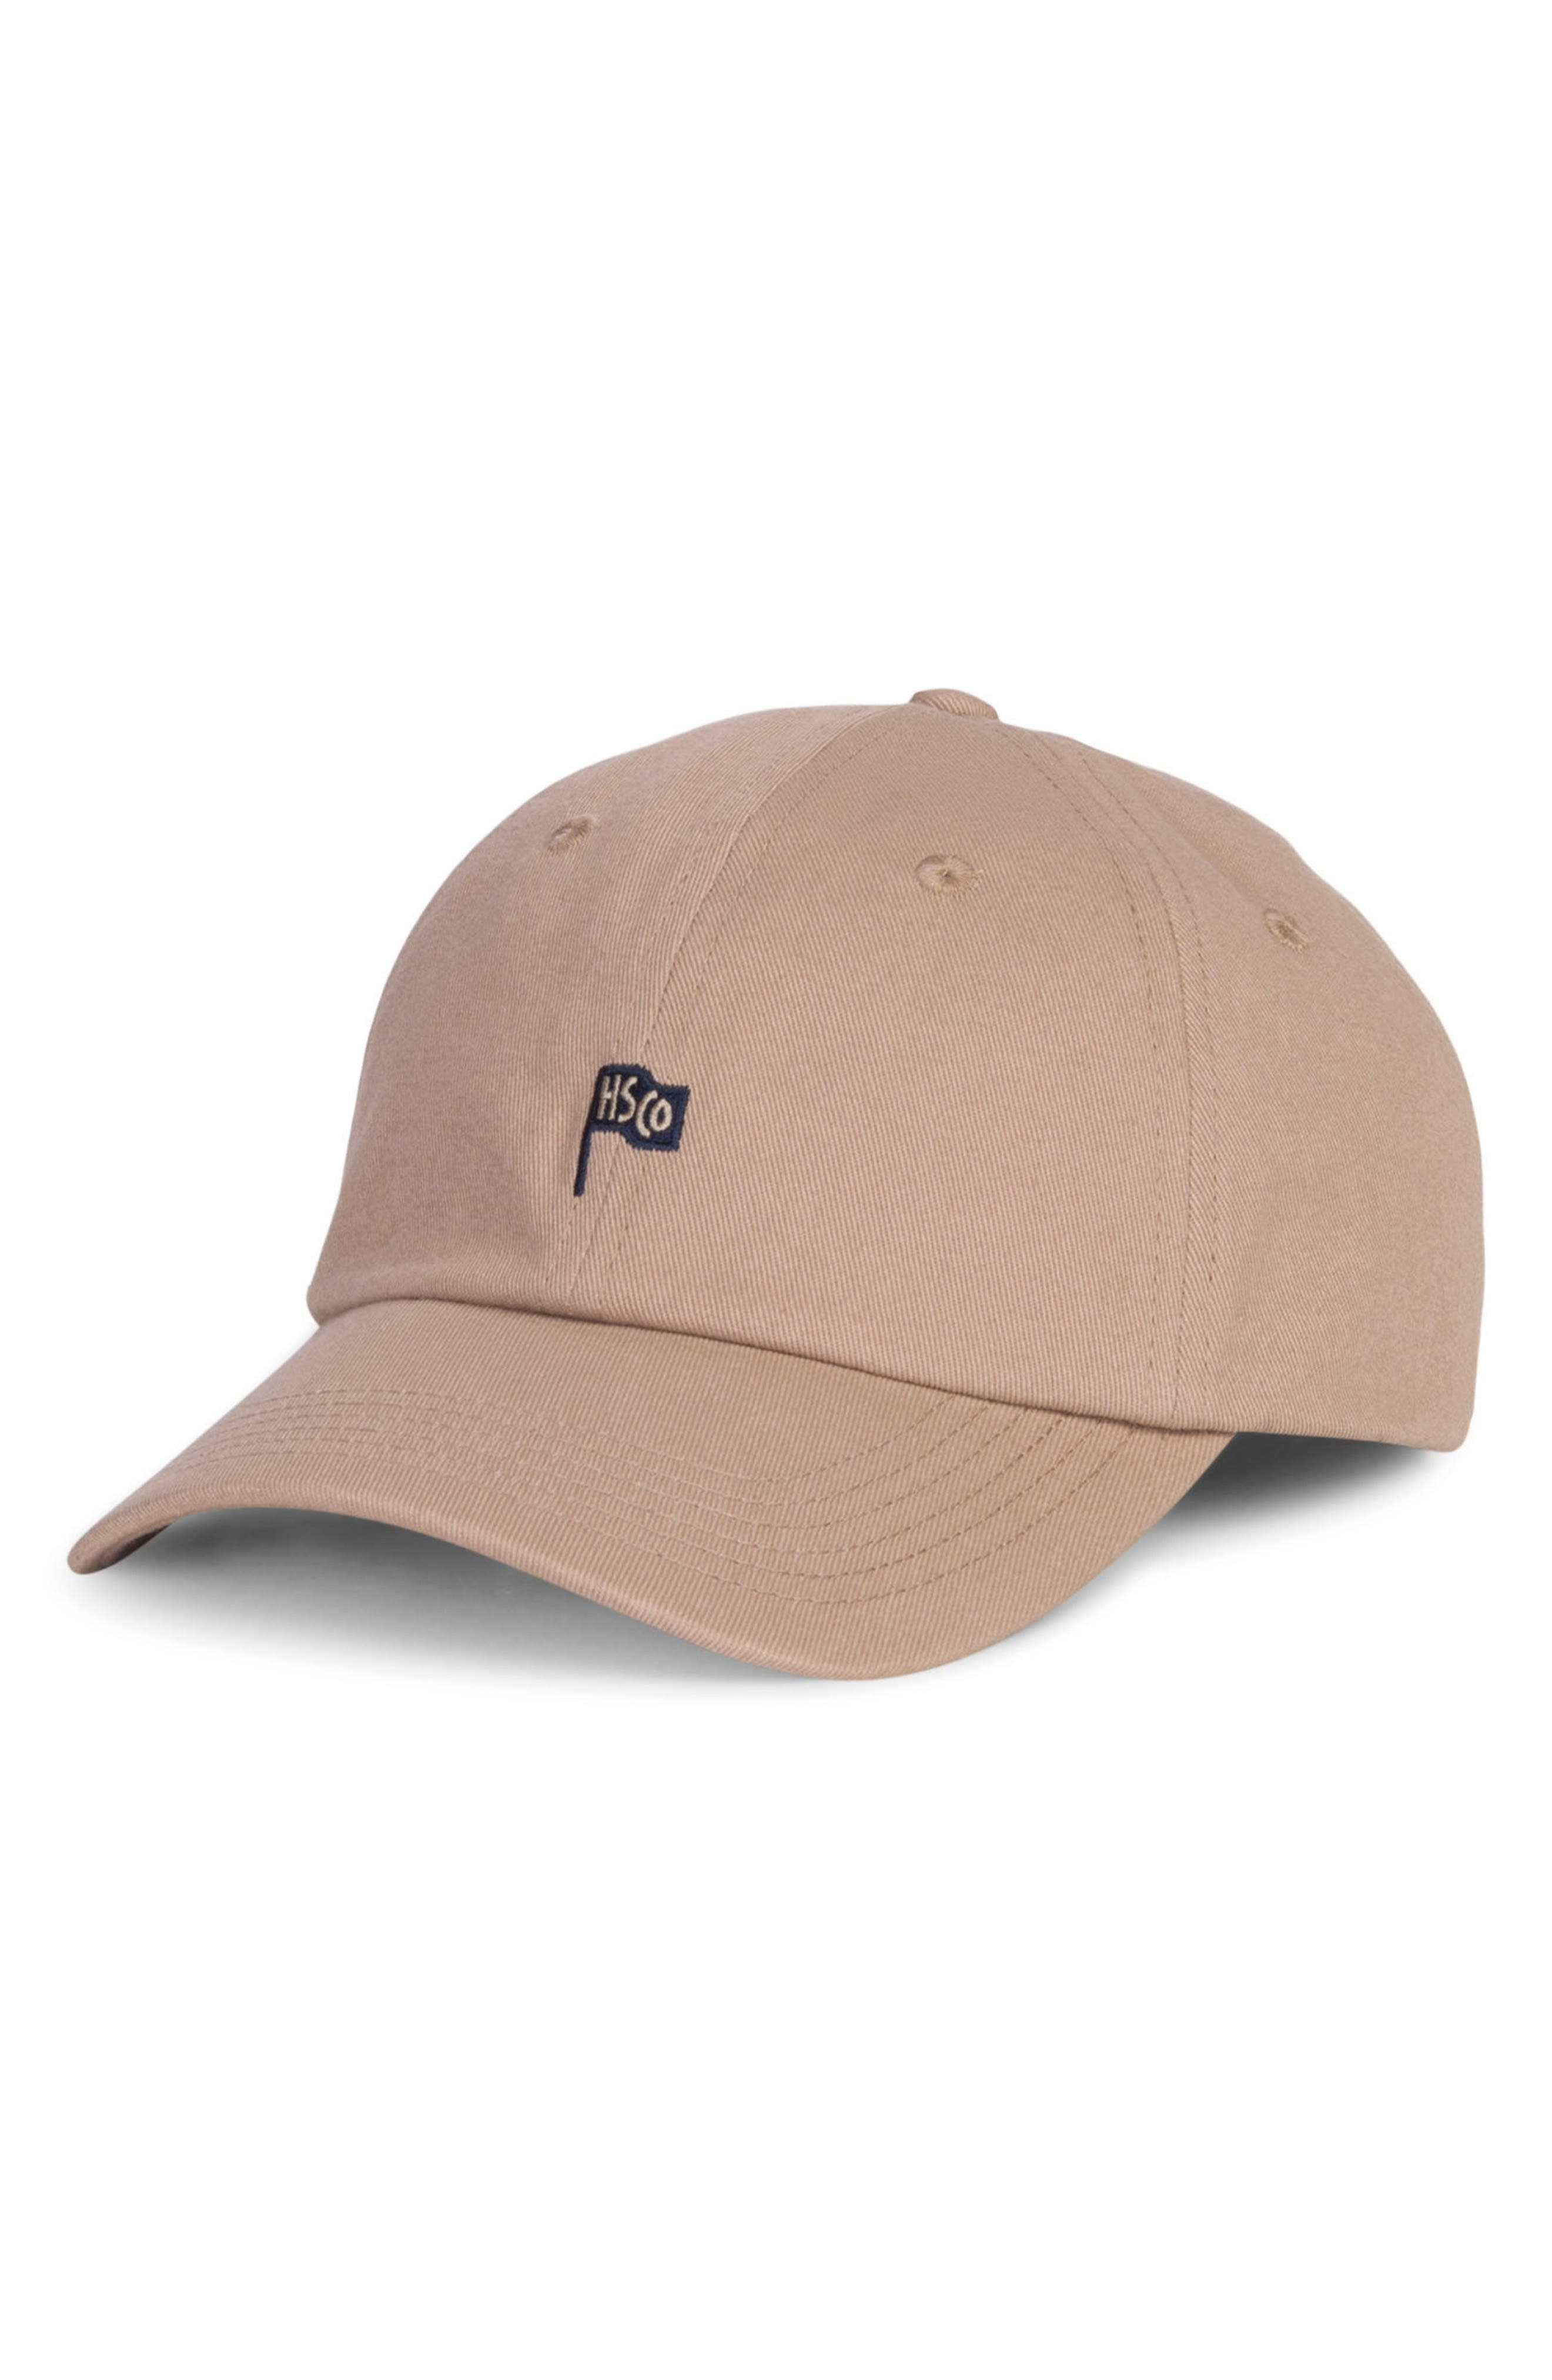 Sylas Baseball Cap,                             Main thumbnail 1, color,                             Khaki